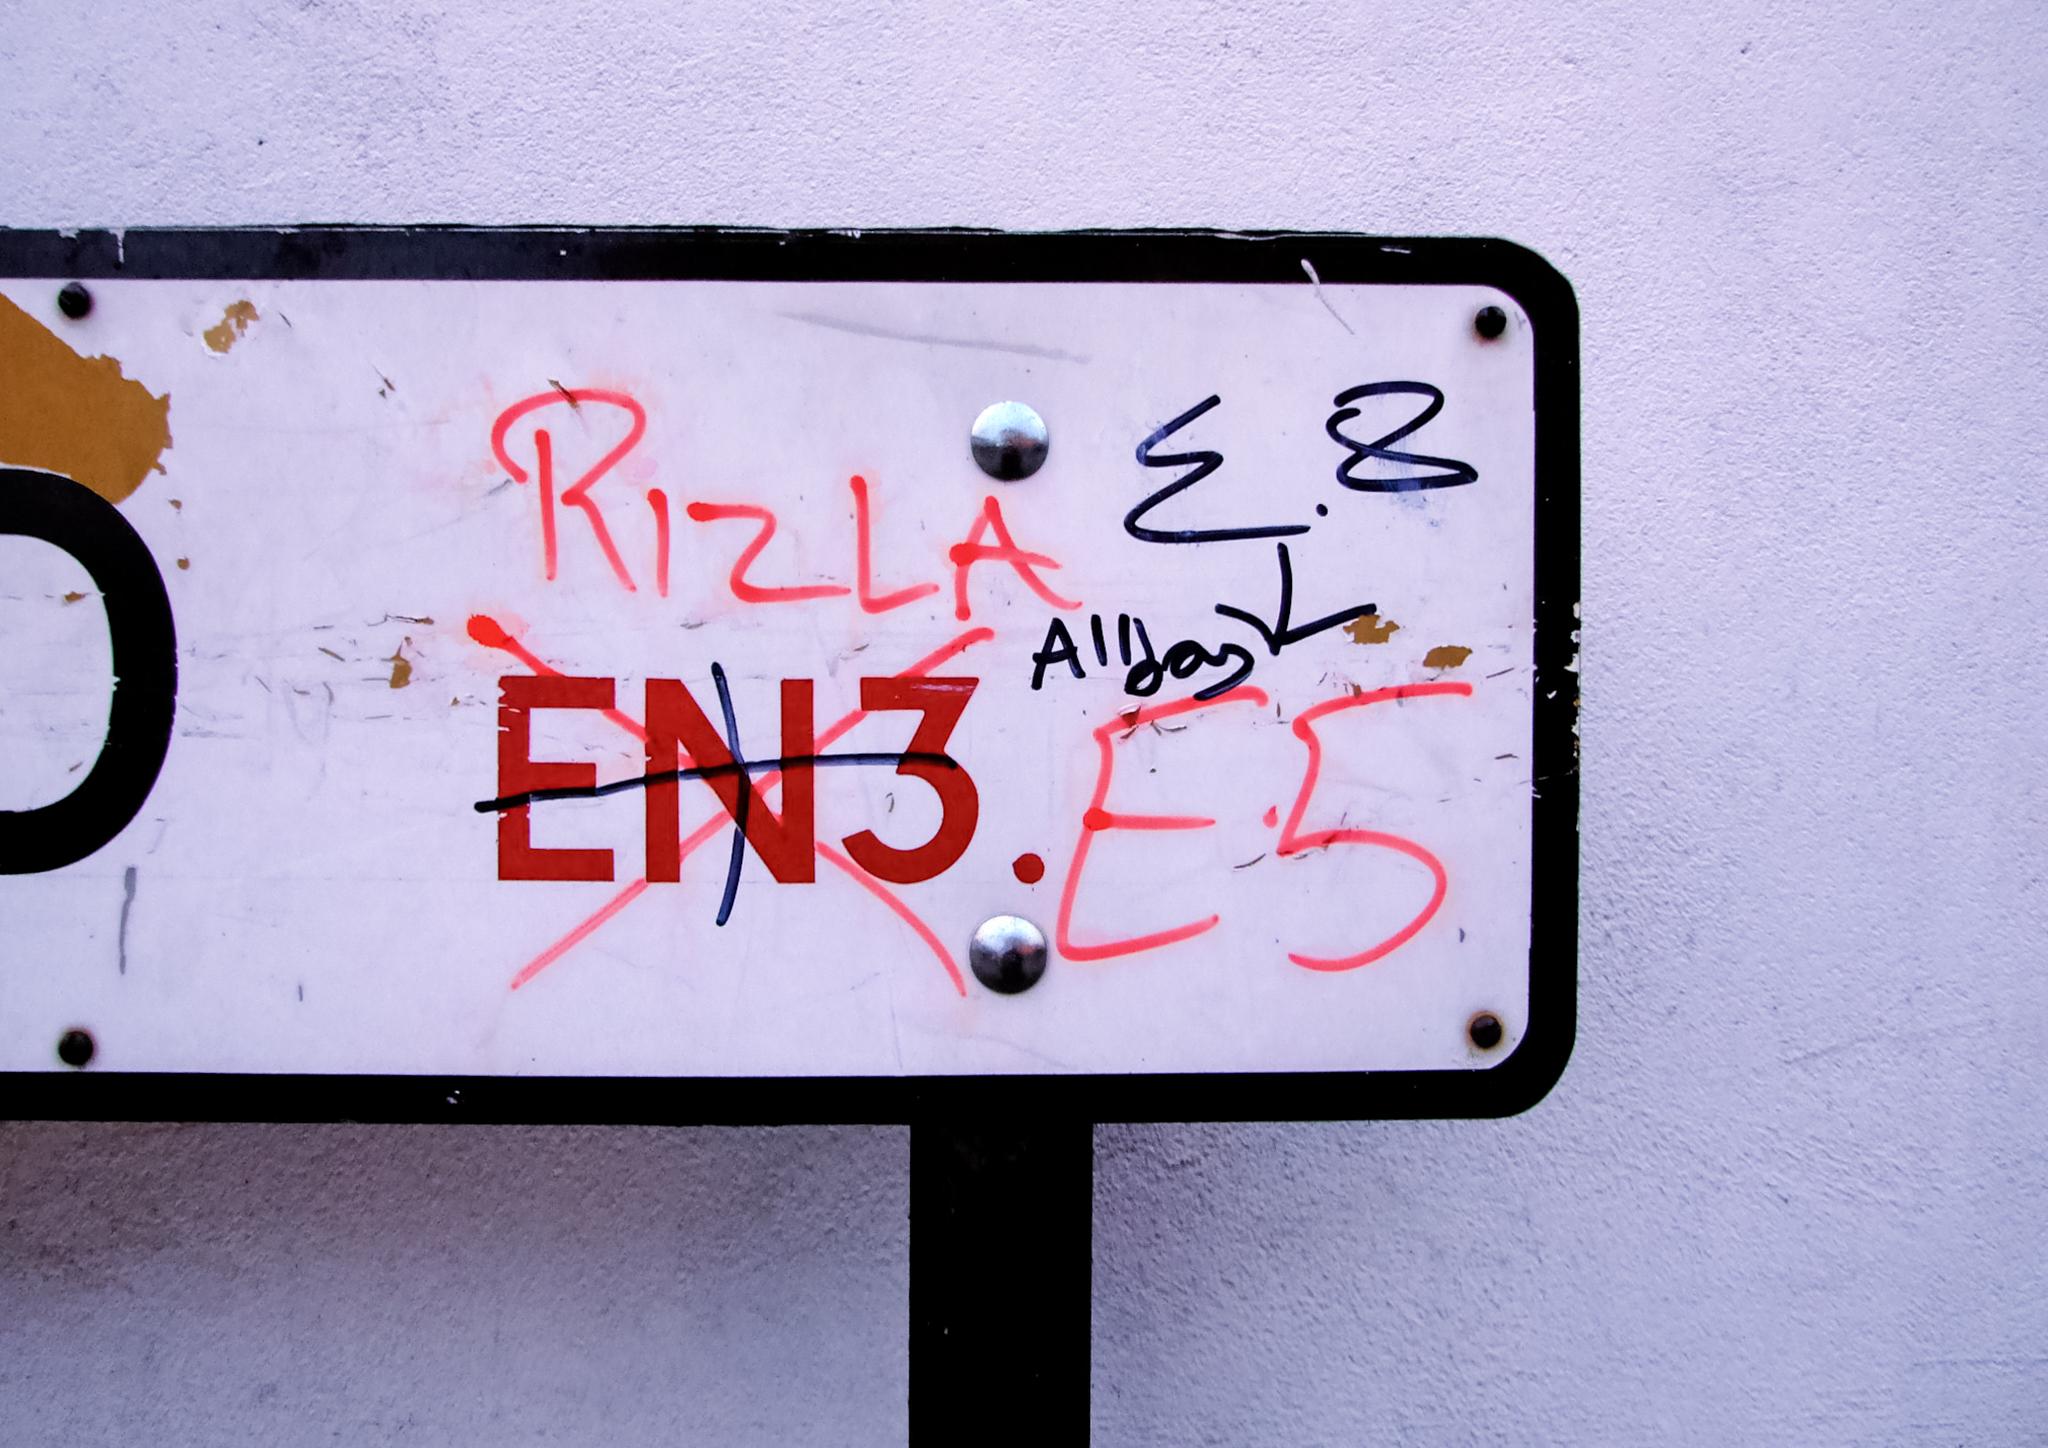 EN3 (A4)